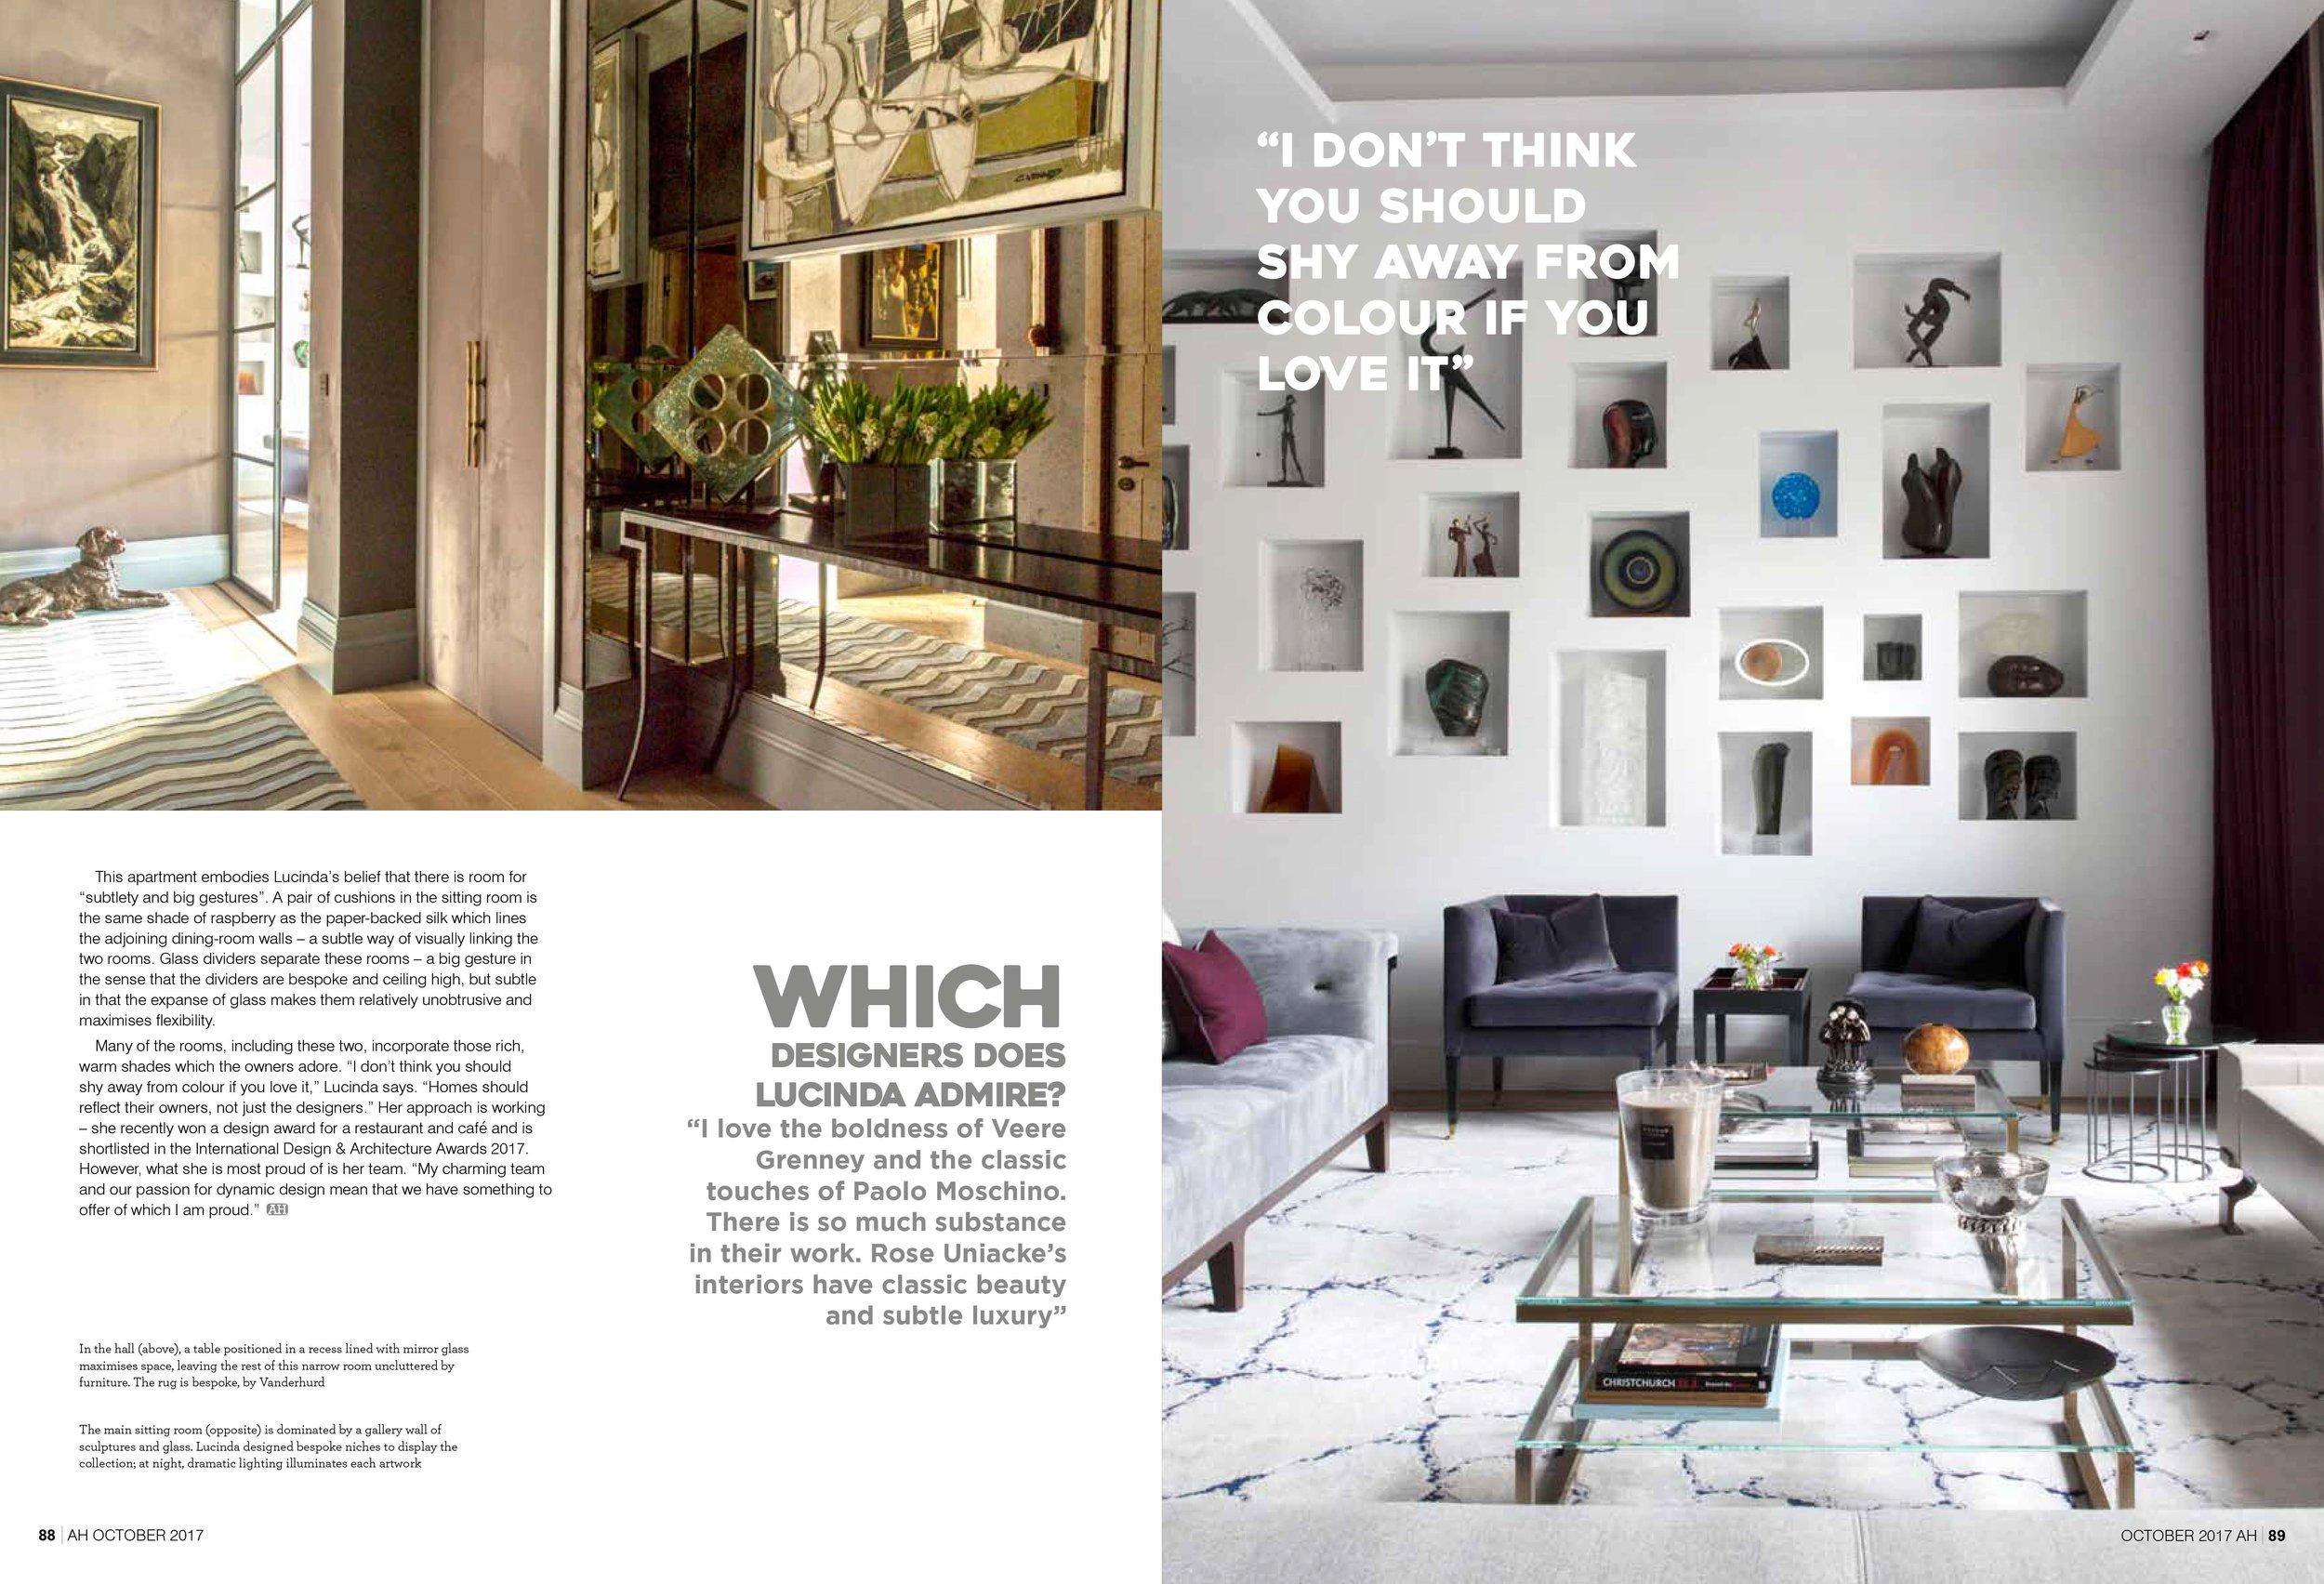 sanford-interior-design-architect-building